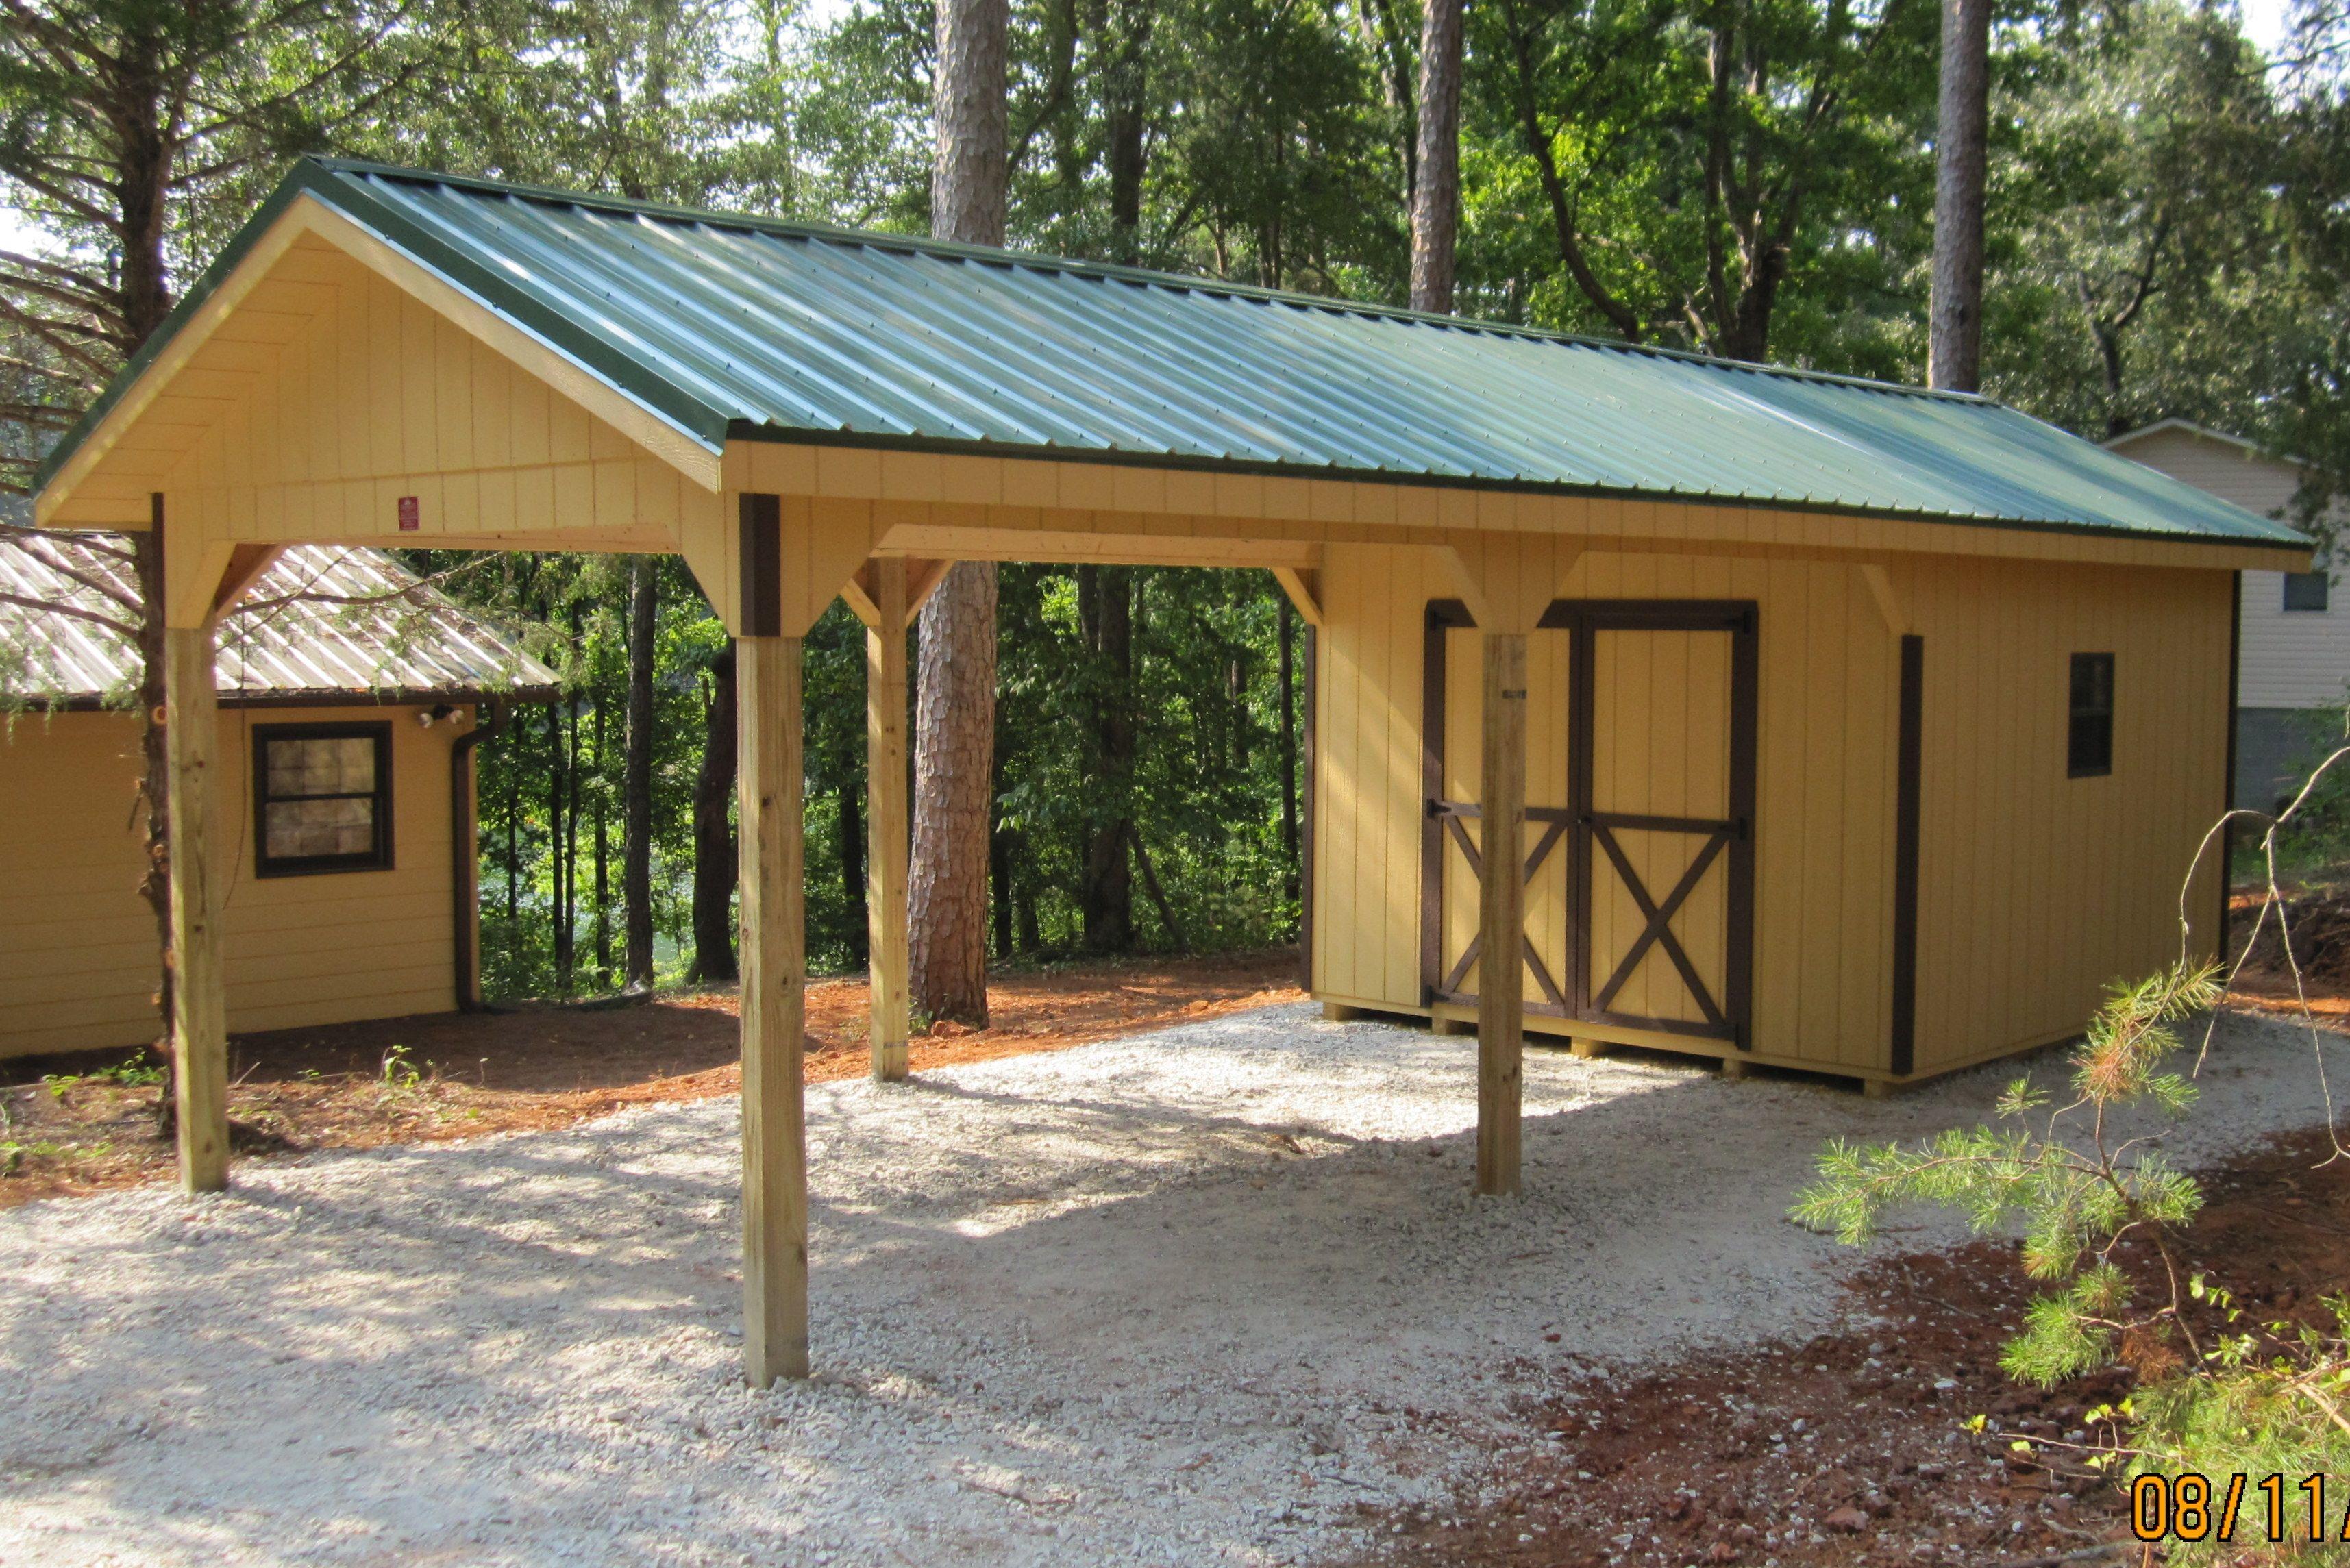 Storage Sheds With Images Building A Shed Carport Plans